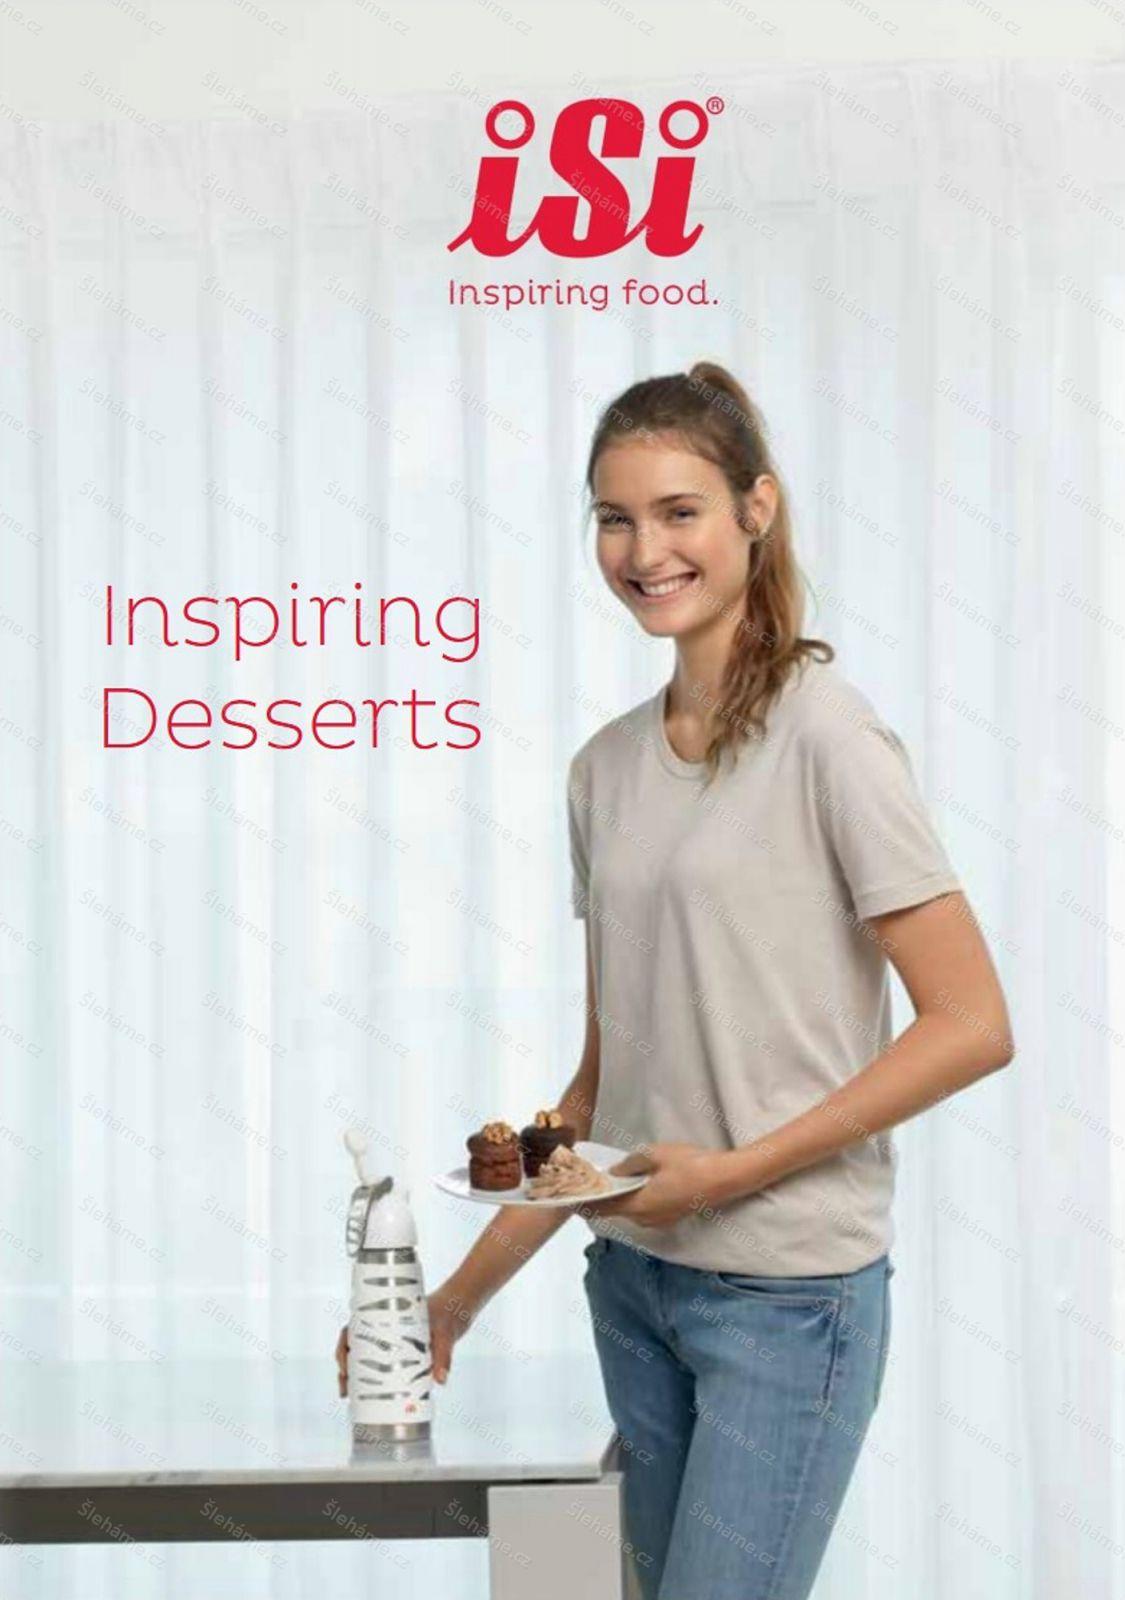 Kuchařka pro šlehače iSi INSPIRING DESSERTS